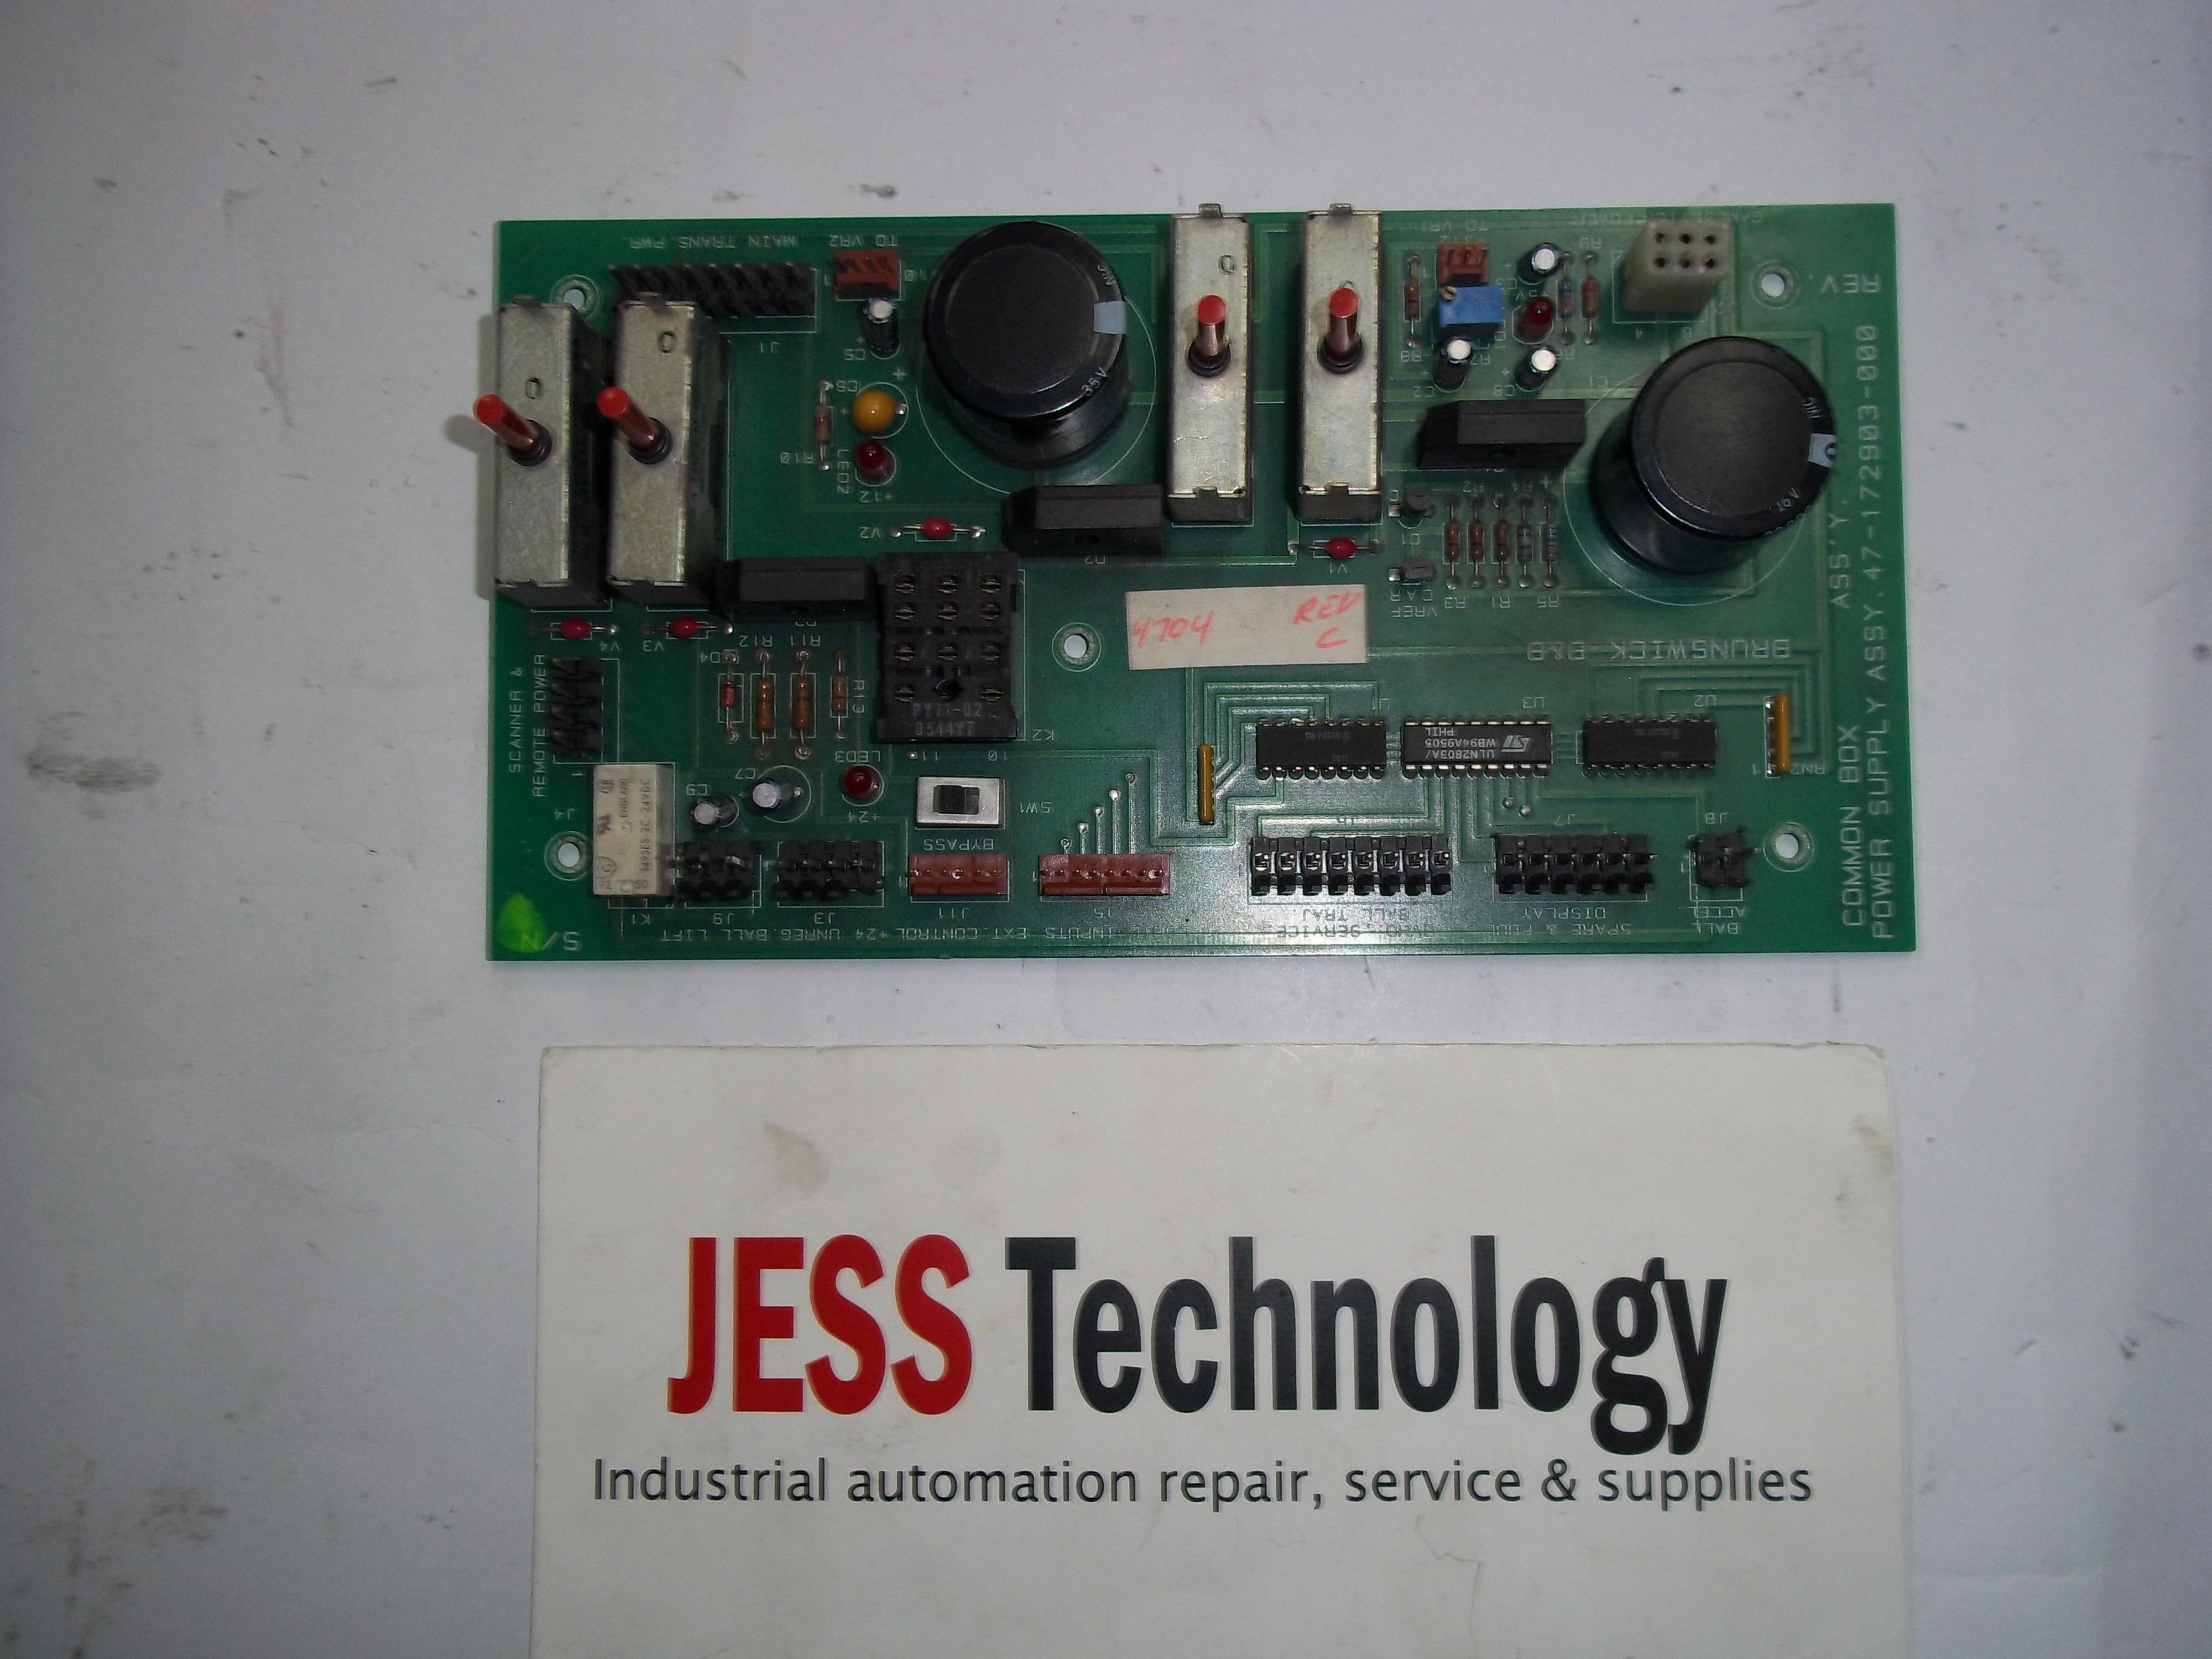 Repair ASSY 47-17-2903-000 BRUNSWICK B&B  COMMON BOX POWER SUPPLY ASSY 47-72903-000 in Malaysia, Singapore, Thailand, Indonesia